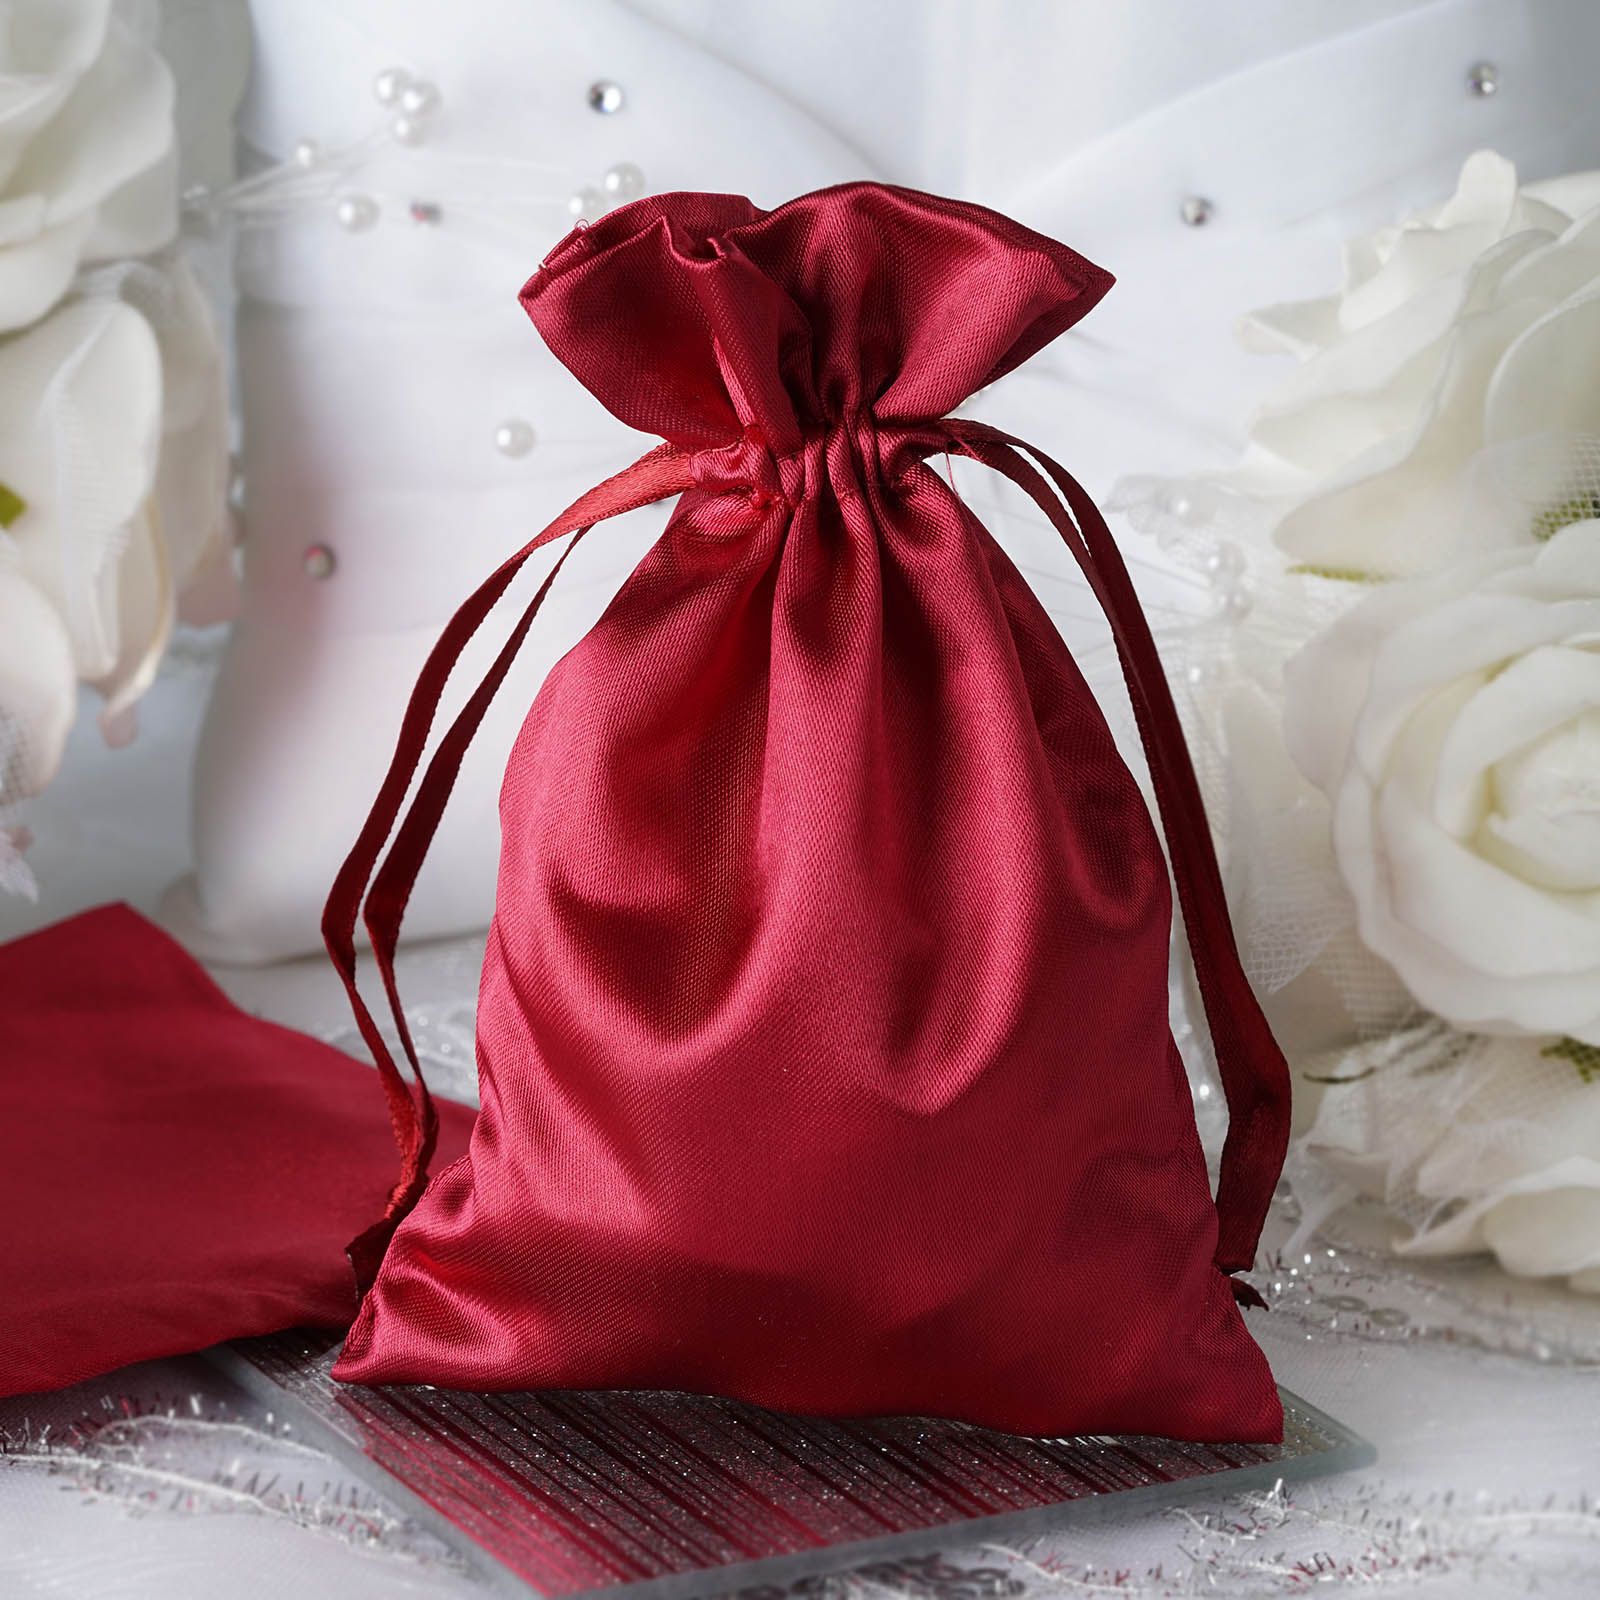 120 Pcs 4x5 Satin Favor Bags Wedding Party Reception Gift Favors